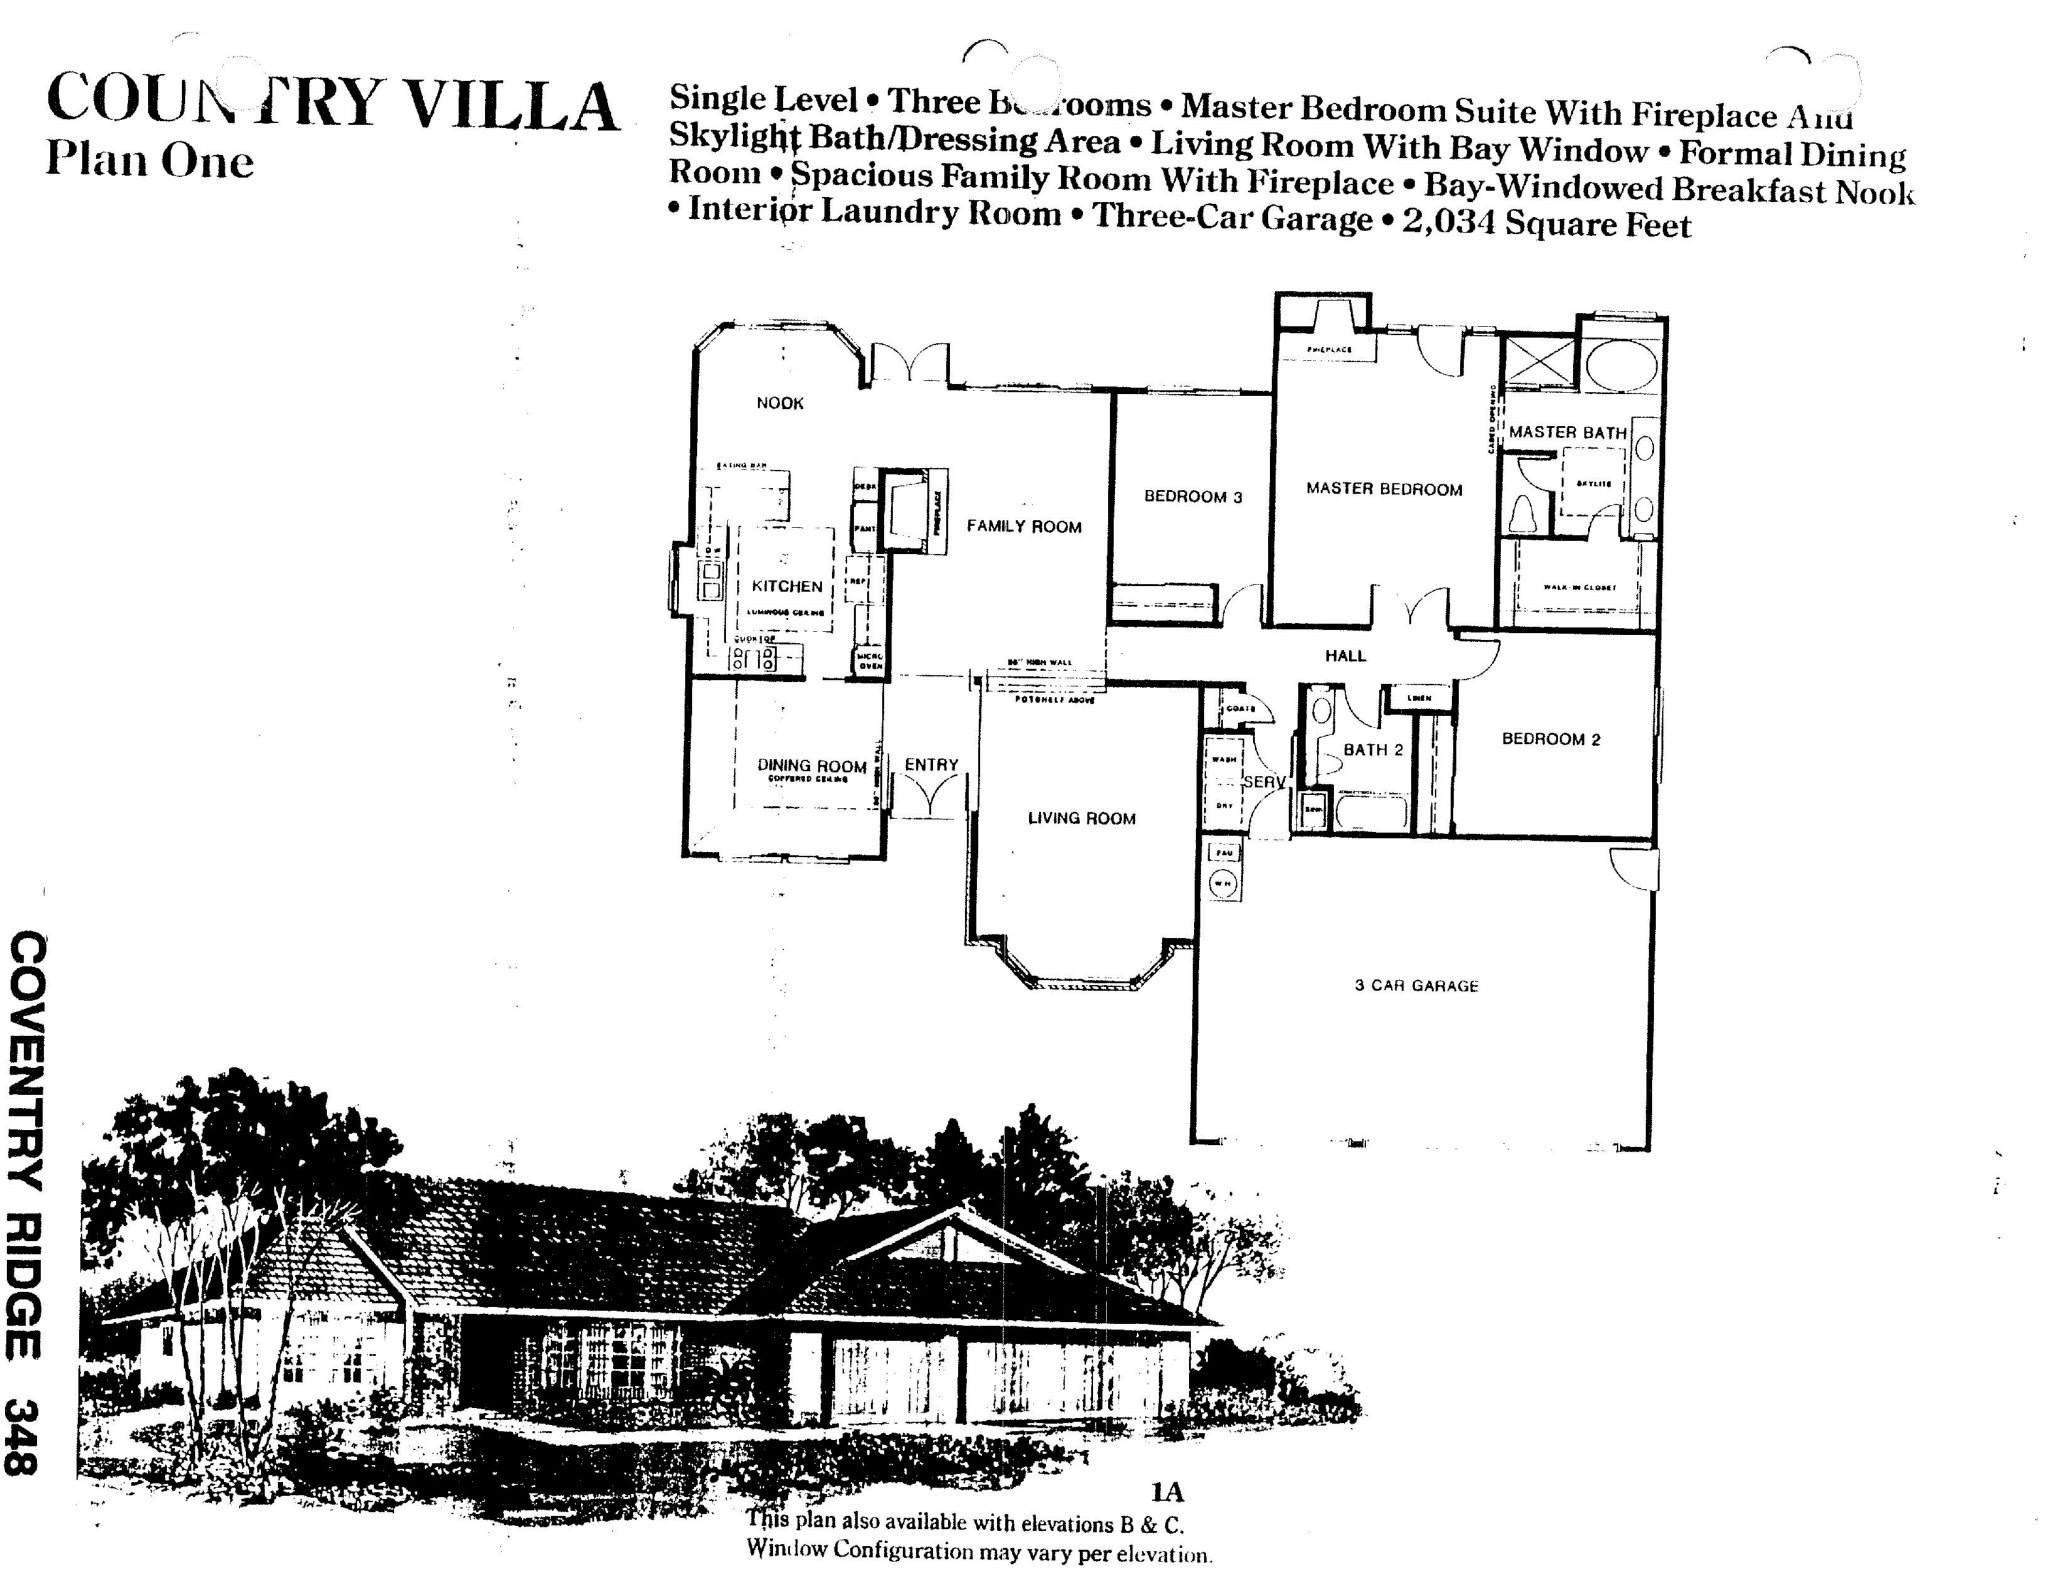 Coventry Ridge - Country Villa - Plan One